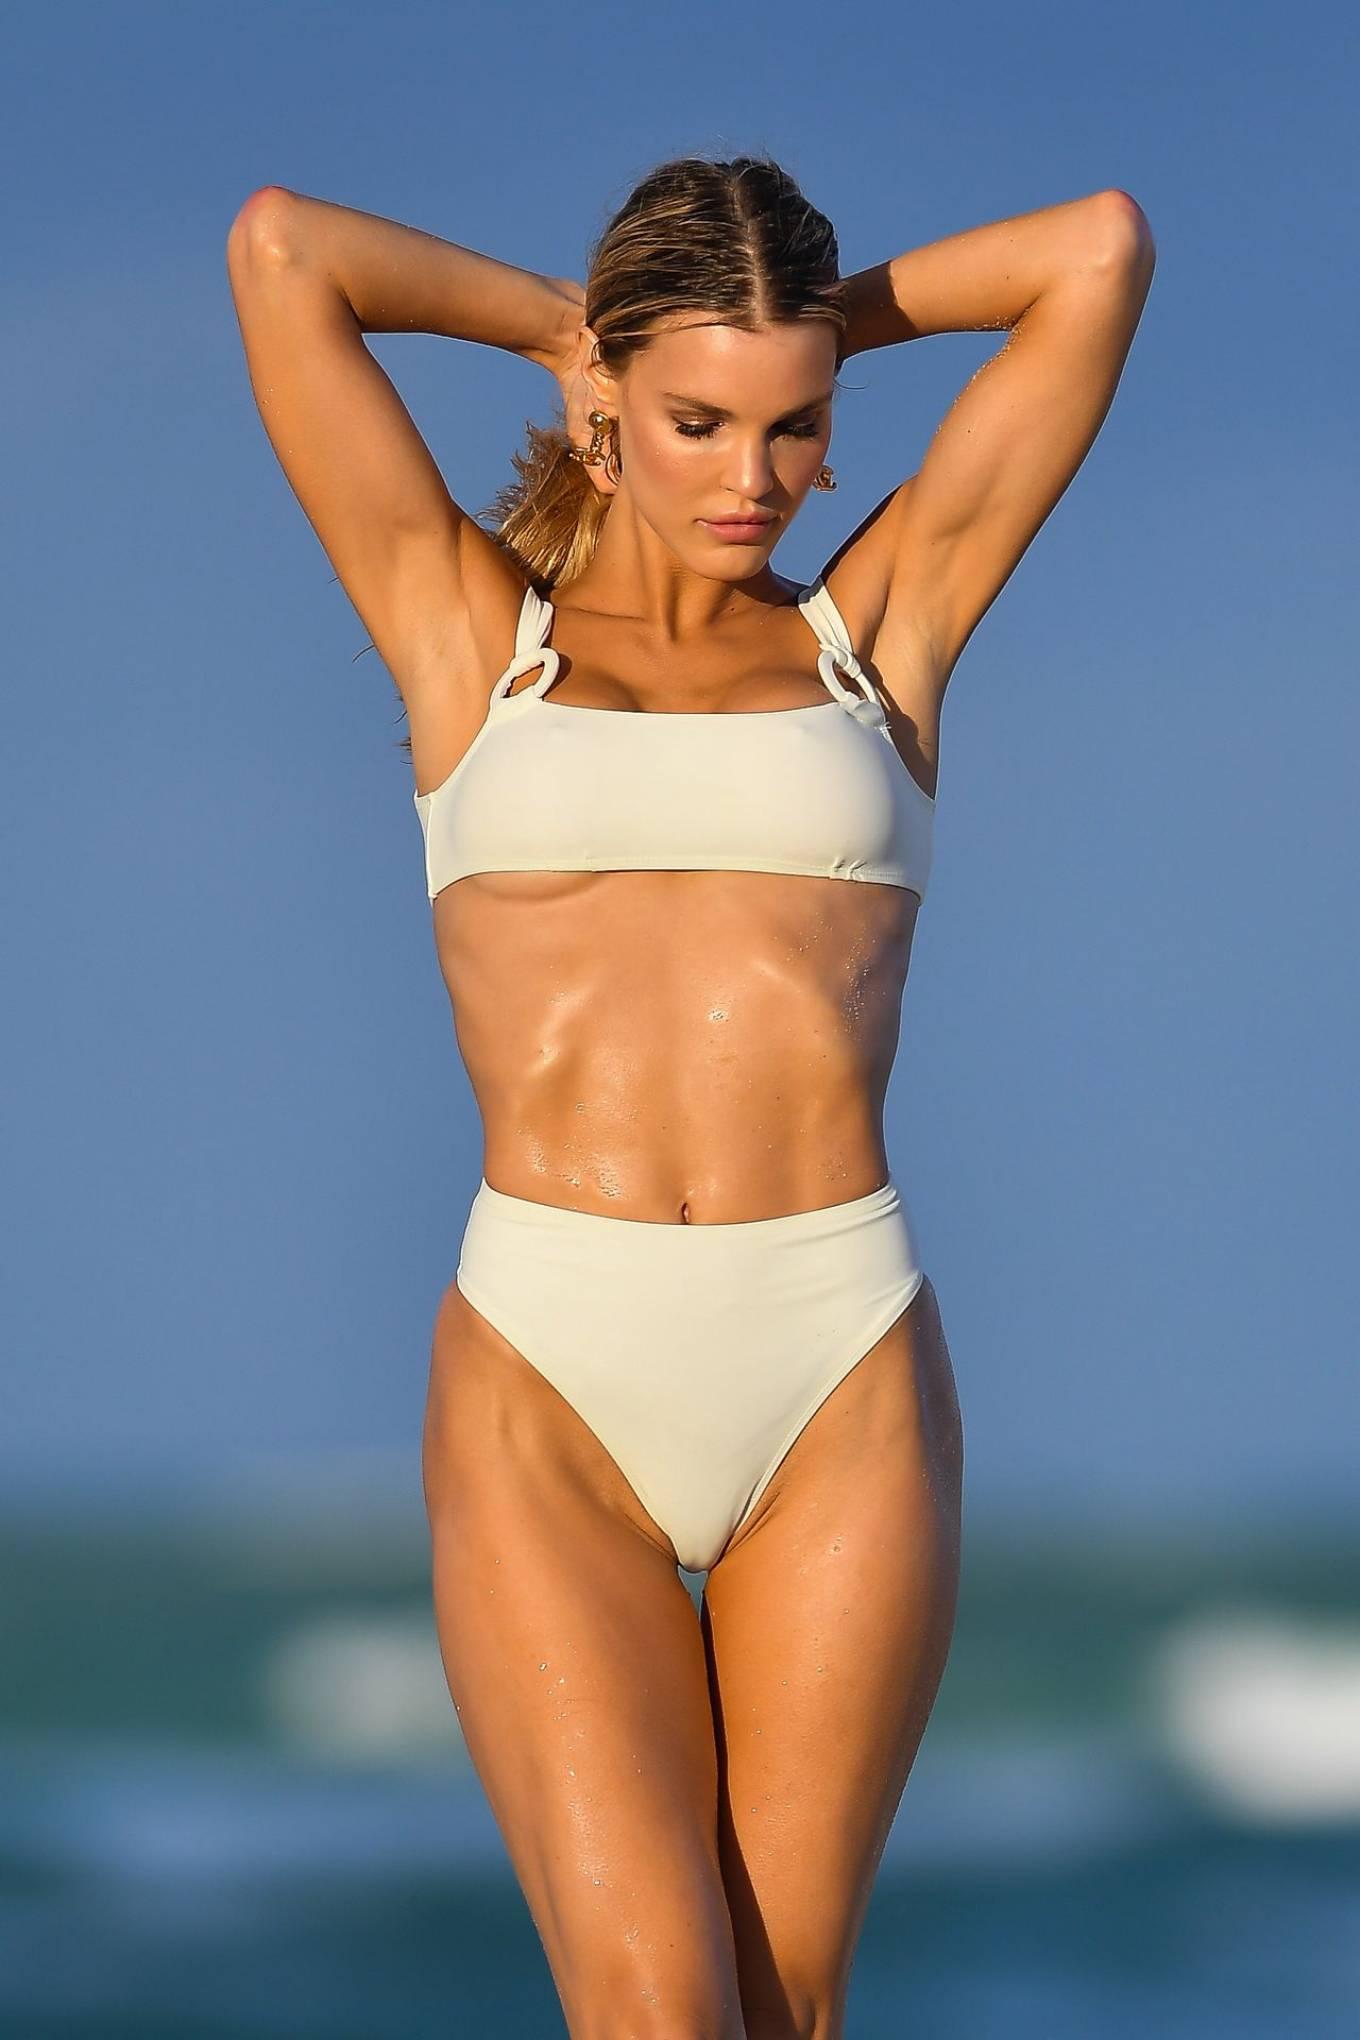 Joy Corrigan - Bikini Photoshoot in Miami Beach